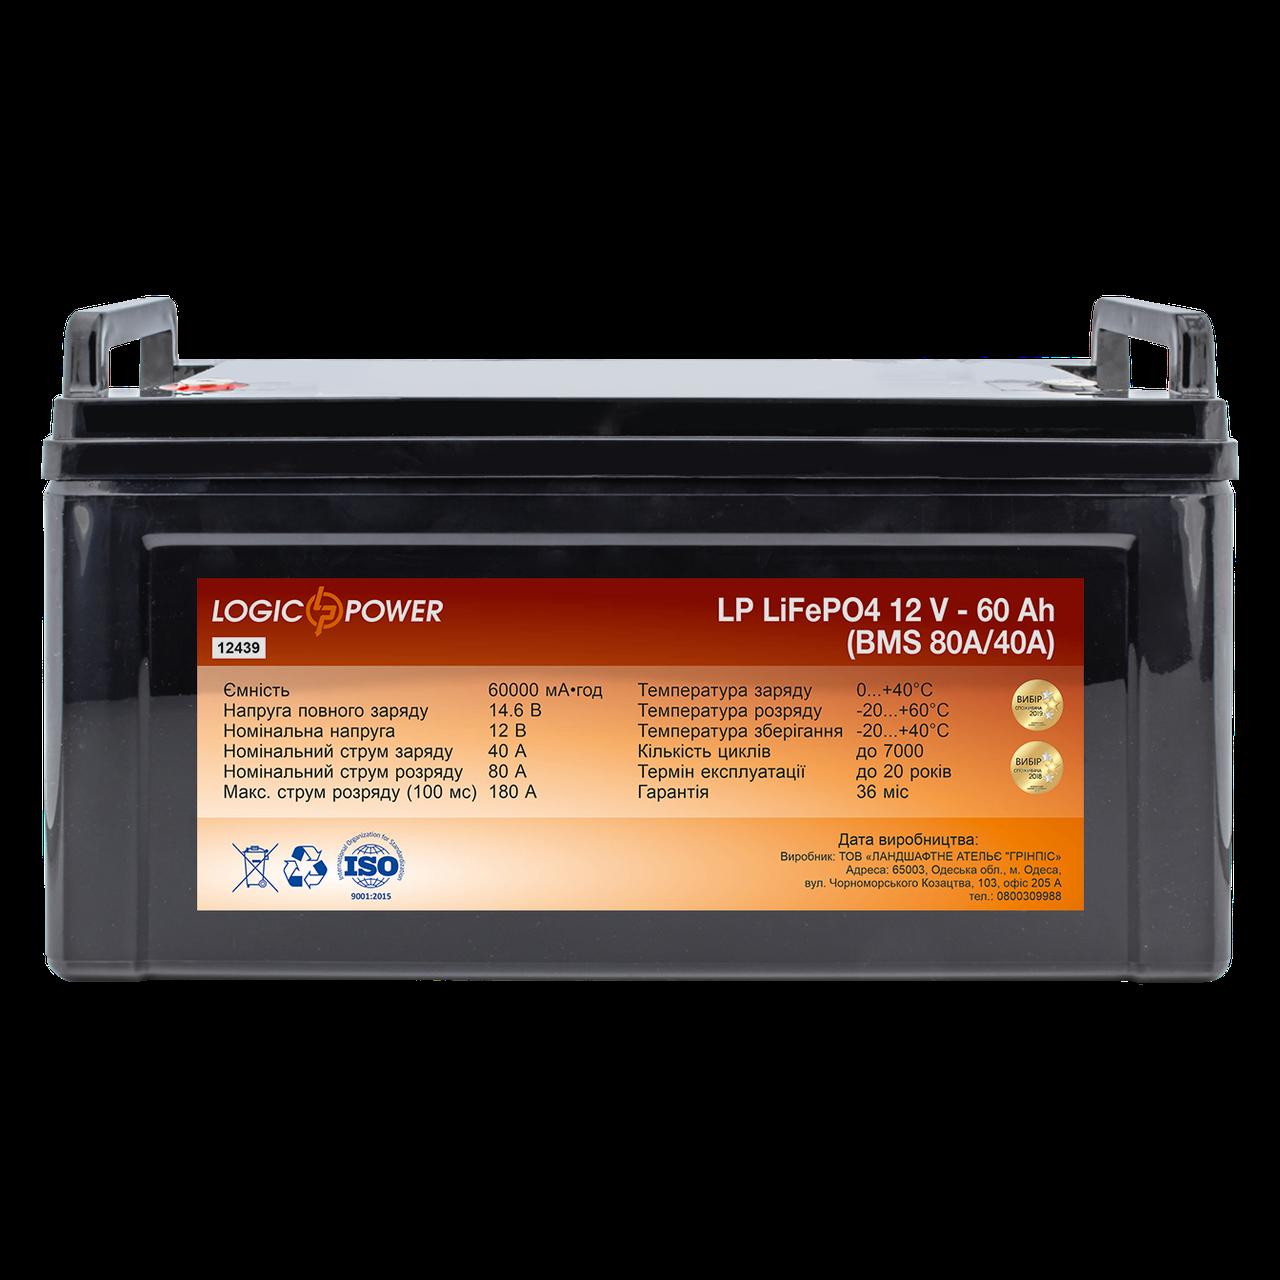 Аккумулятор LP LiFePO4 12 V - 60 Ah (BMS 80A/40А) пластик